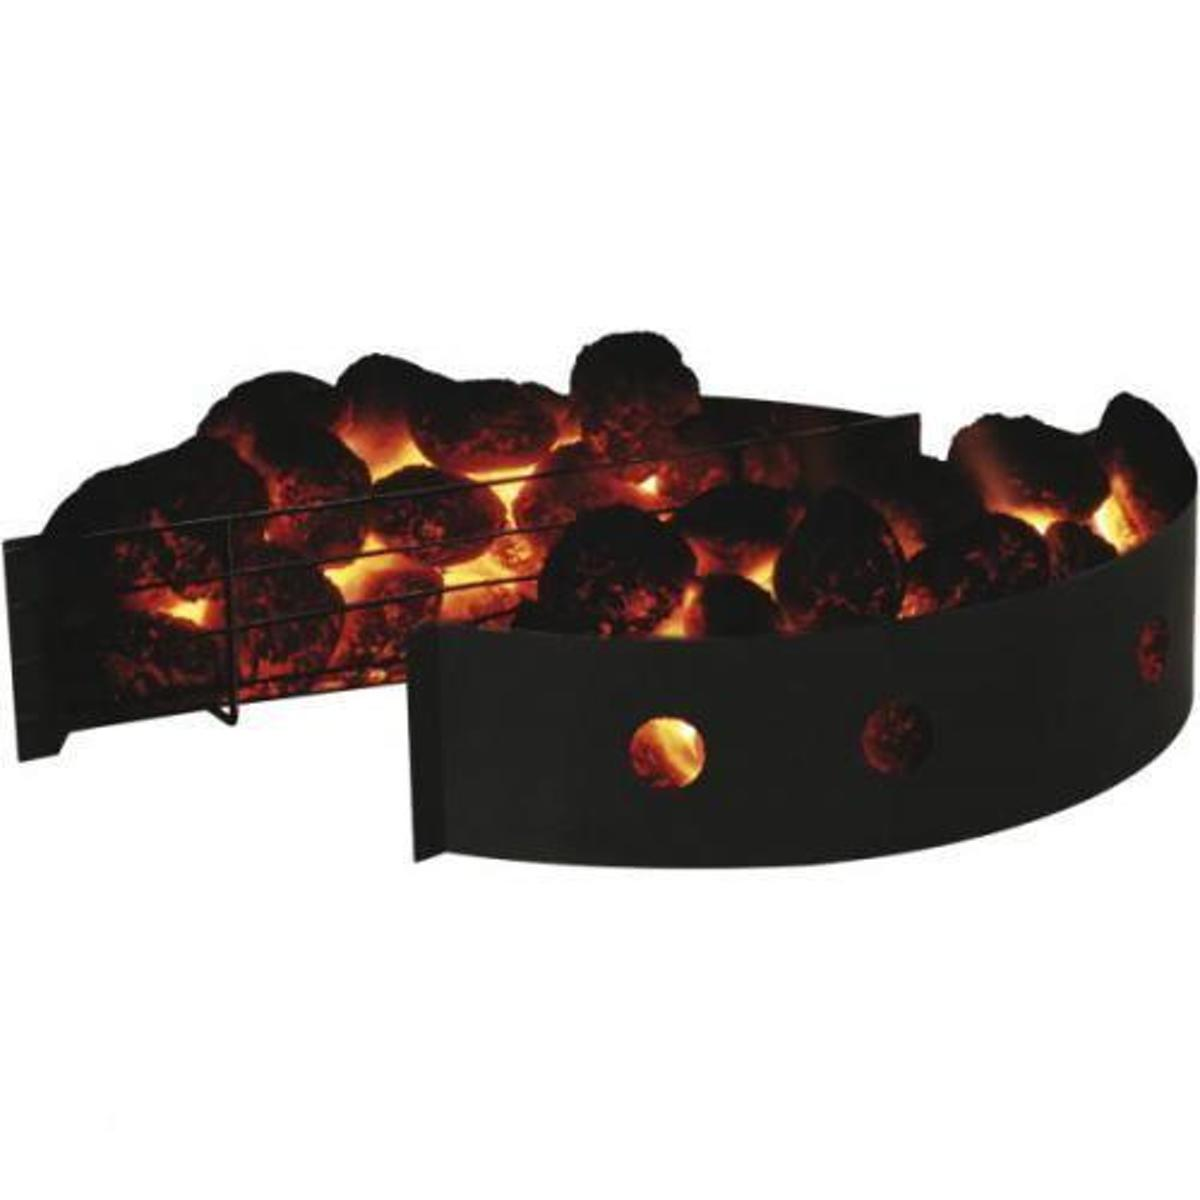 CADAC Charcoal Tray Houtskoolbak kopen